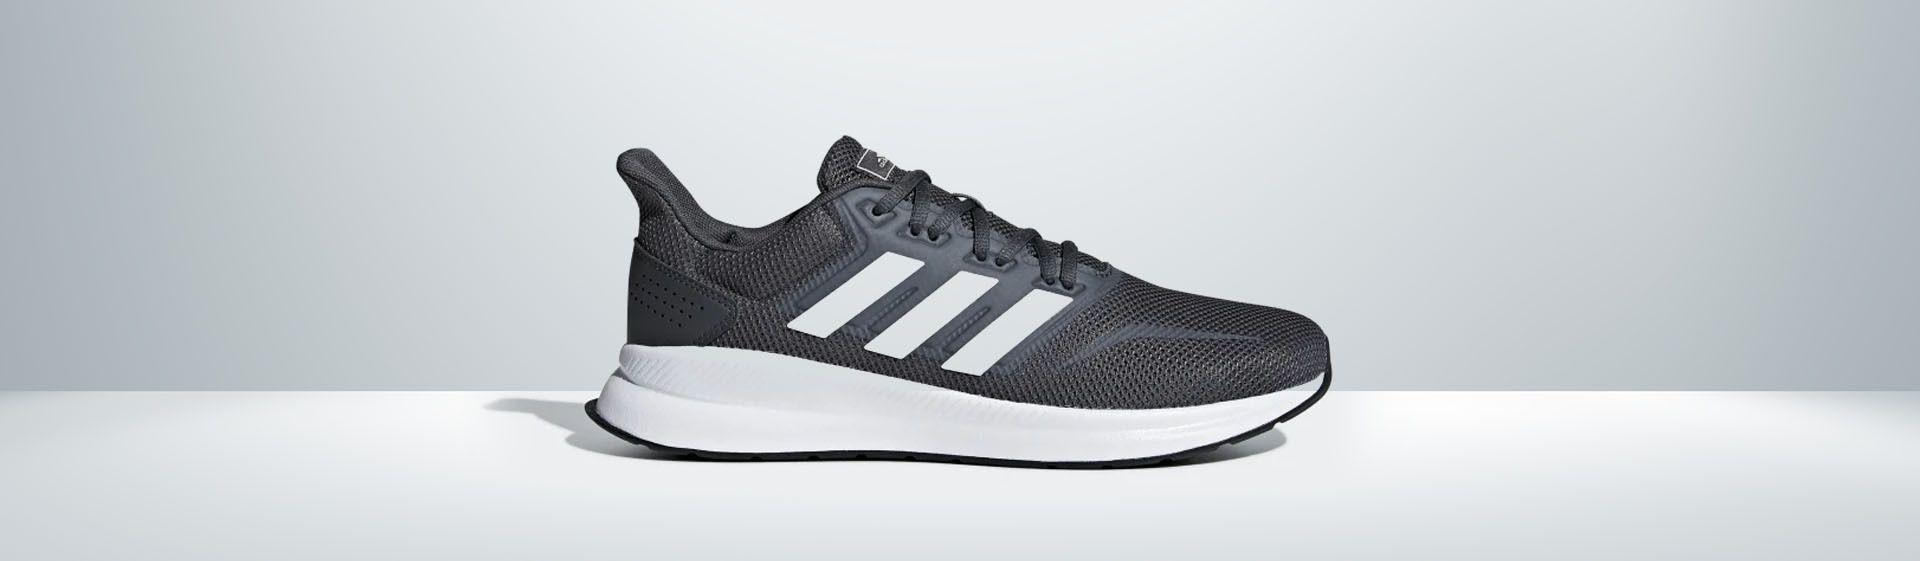 Tênis Adidas Run Falcon é bom? Confira análise do tênis de corrida